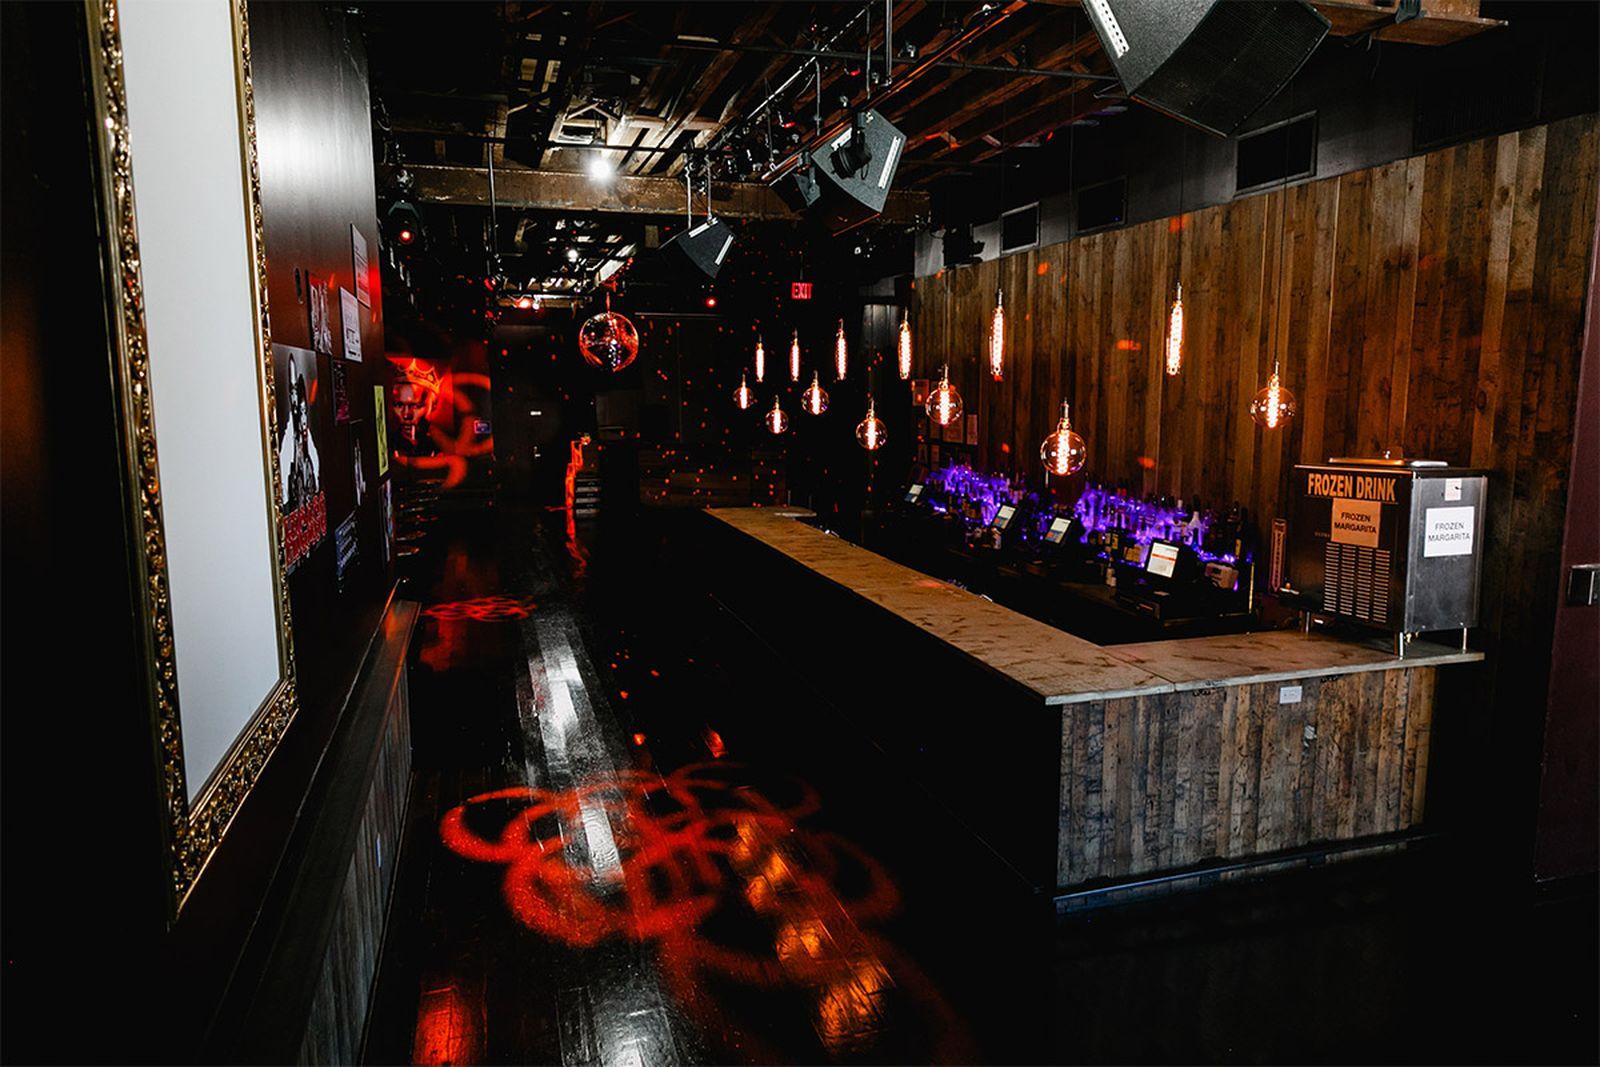 nyc music venues schimanski AMEX american express platinum new york